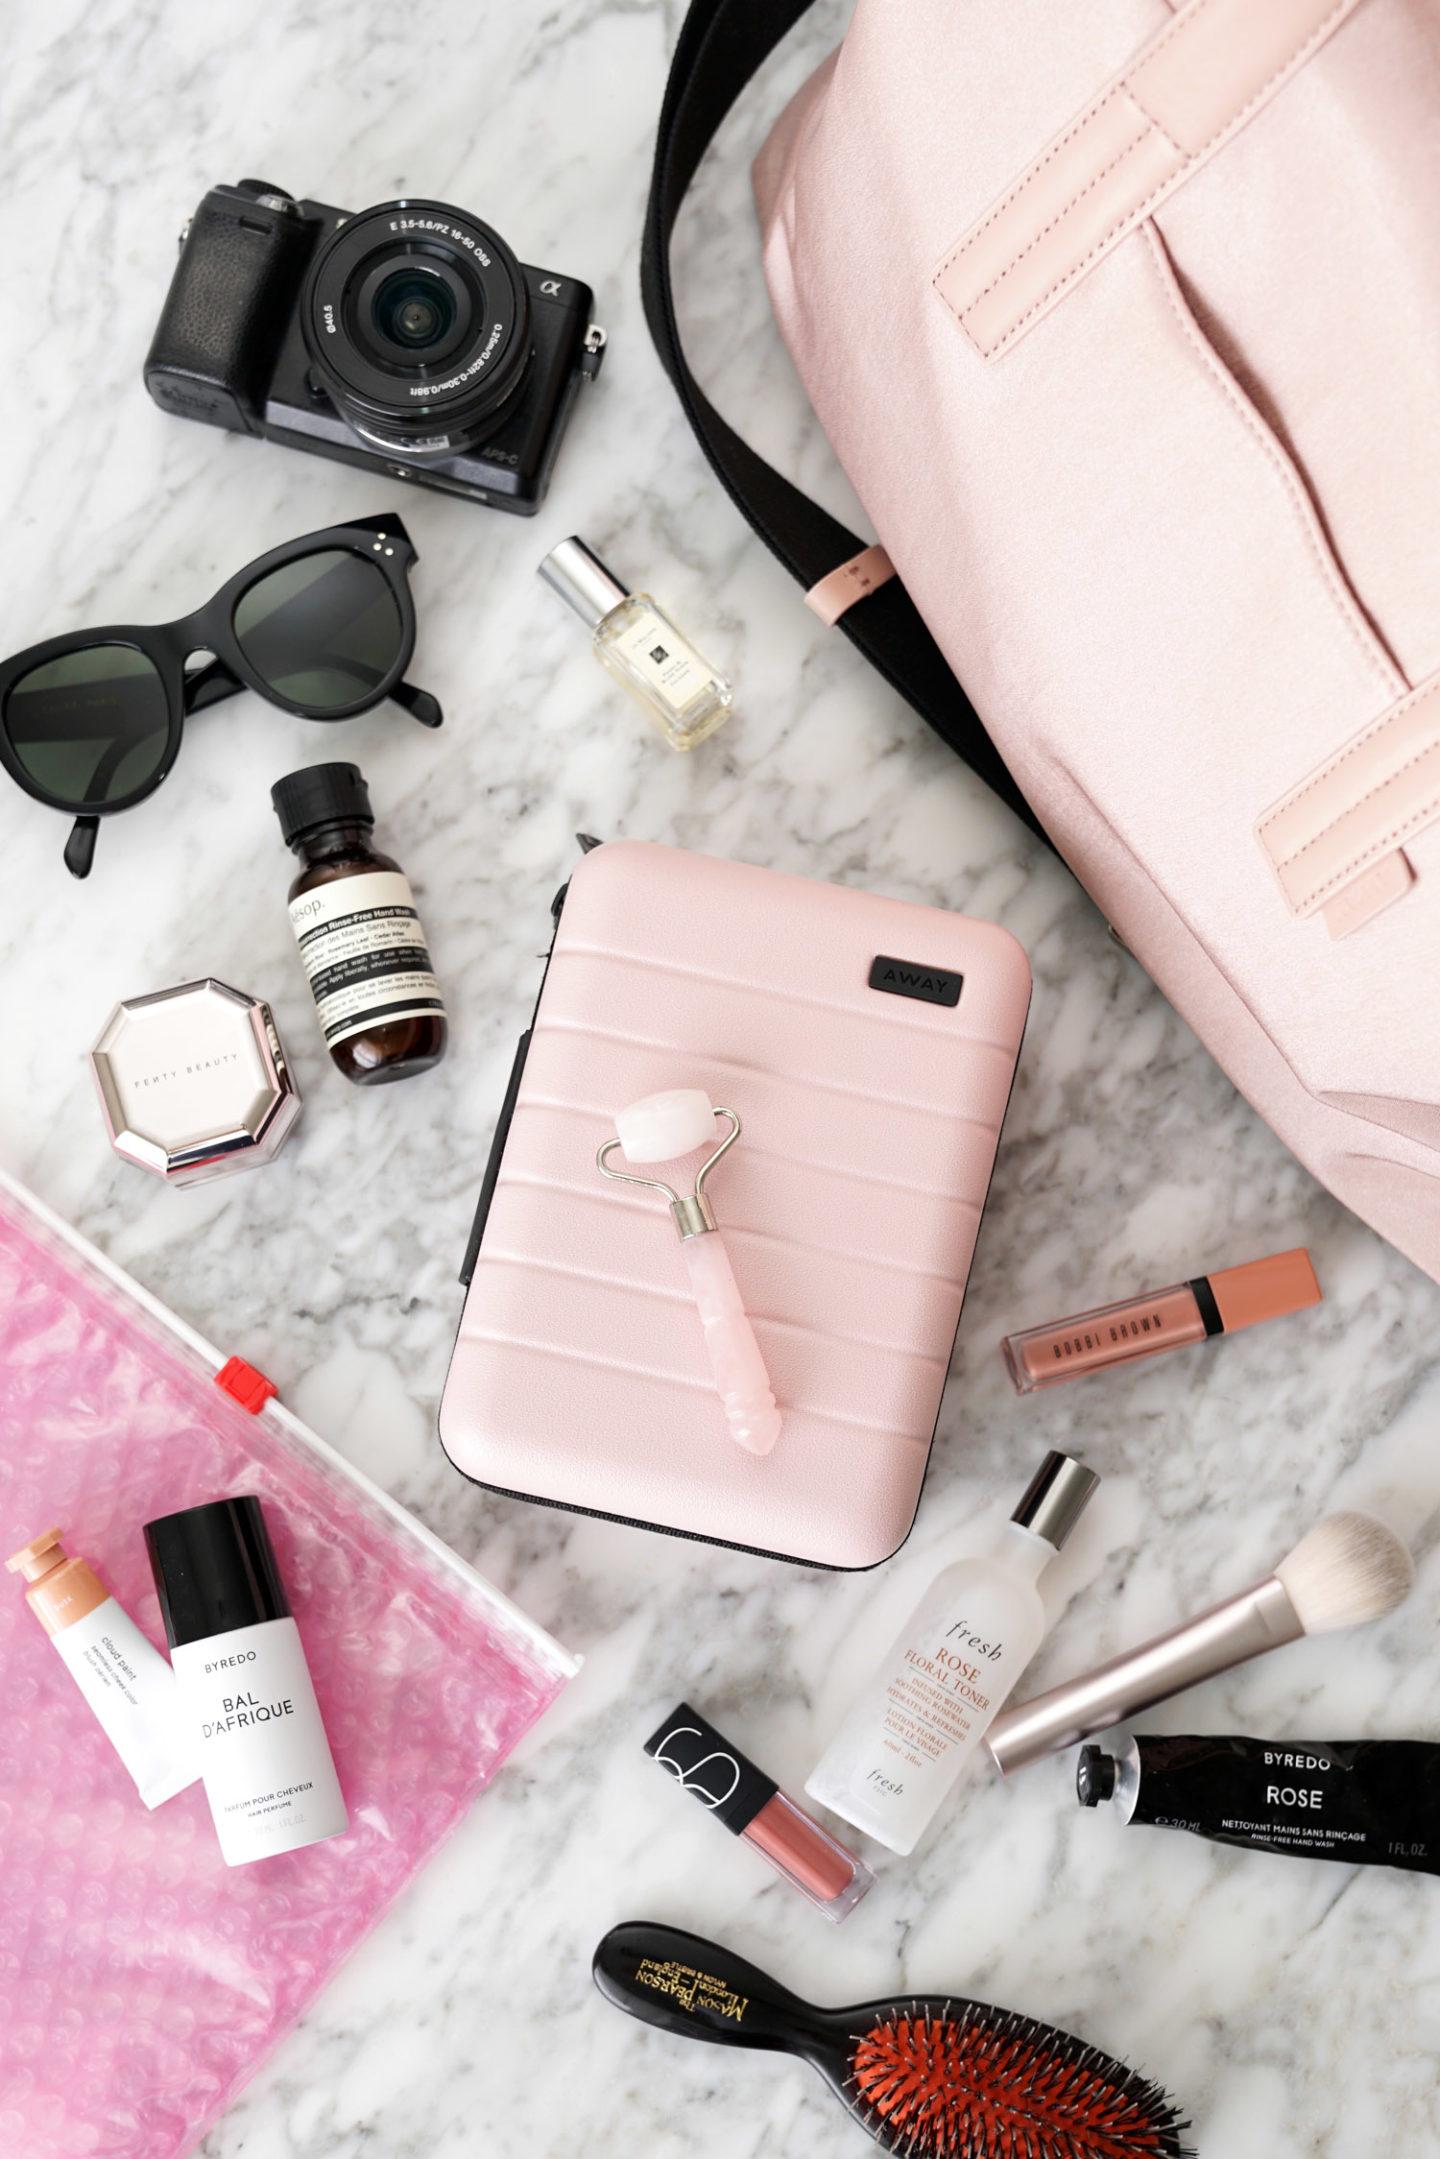 Étui de voyage mini en blush via le look look book